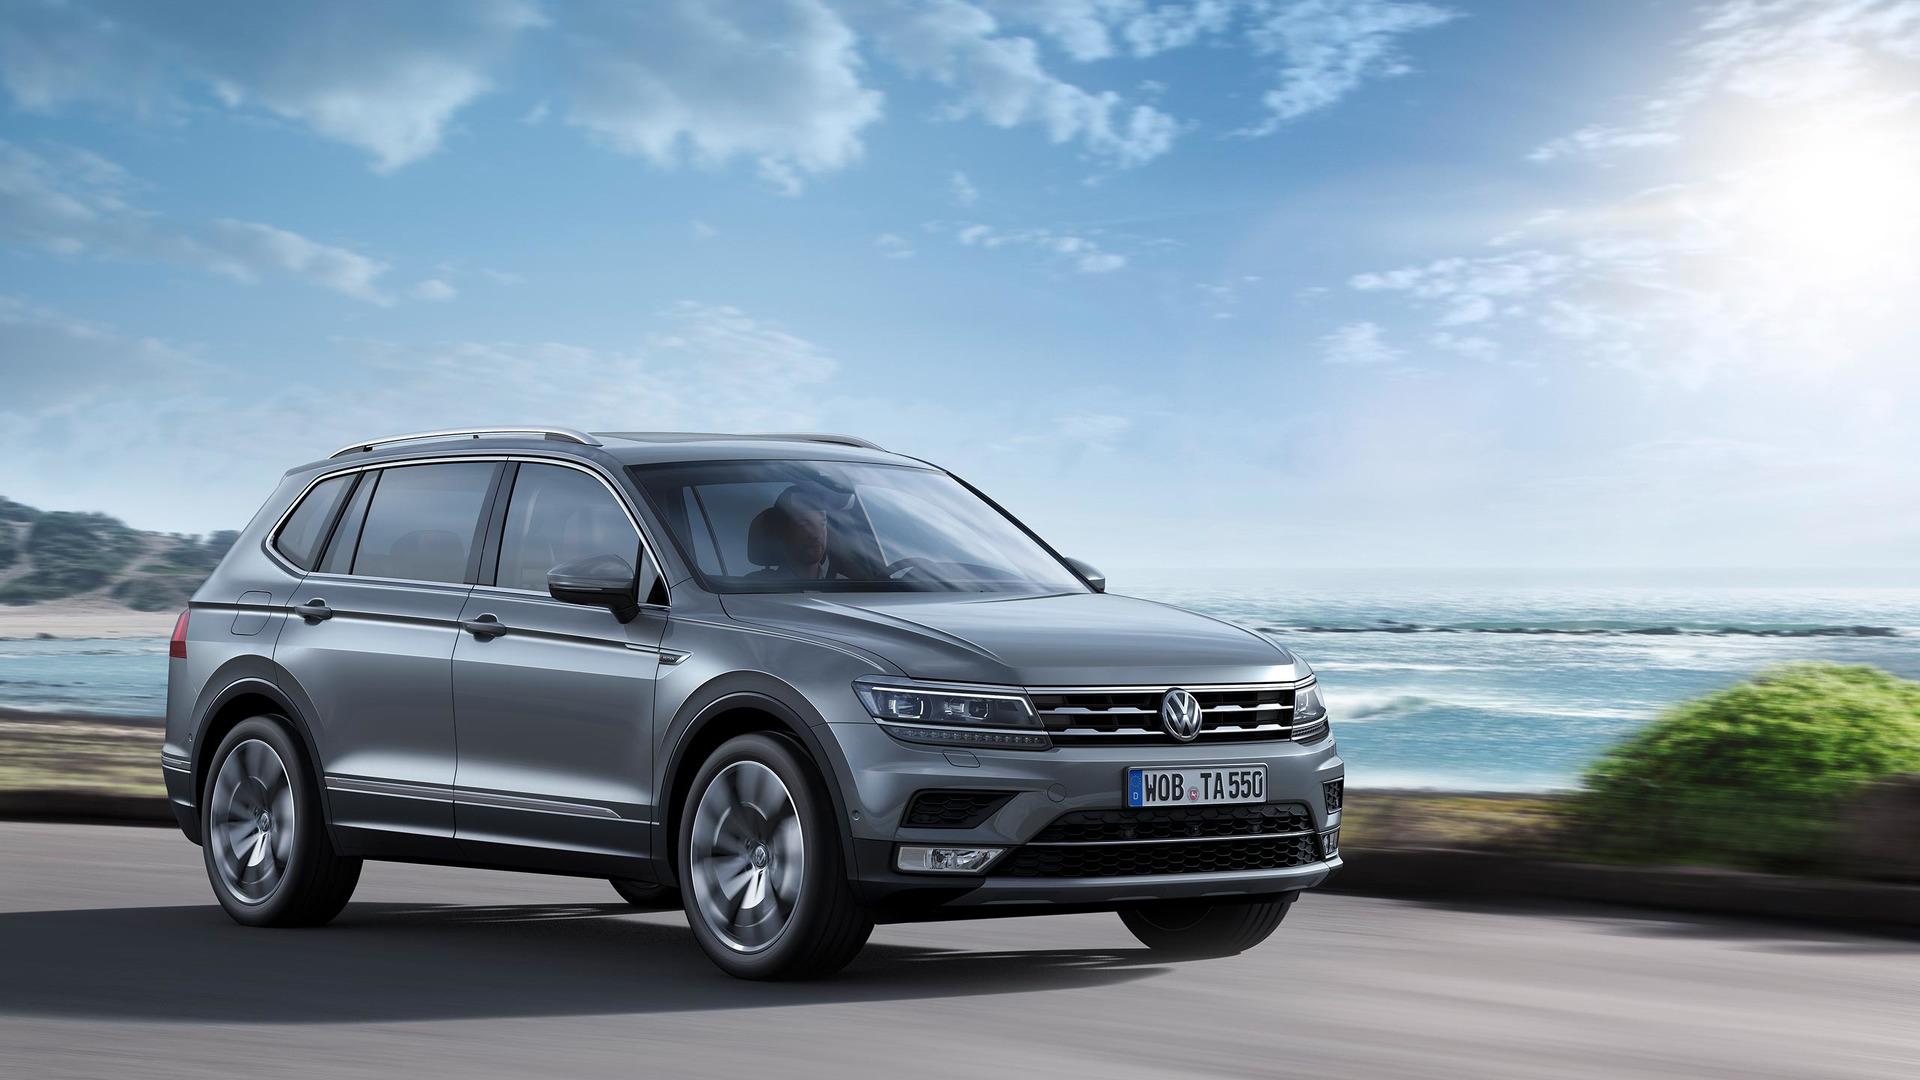 2018 VW Tiguan Allspace: Redesign, Trims, Price >> Vw Tiguan Allspace Arrives In Europe To Spice Up Geneva Motor Show